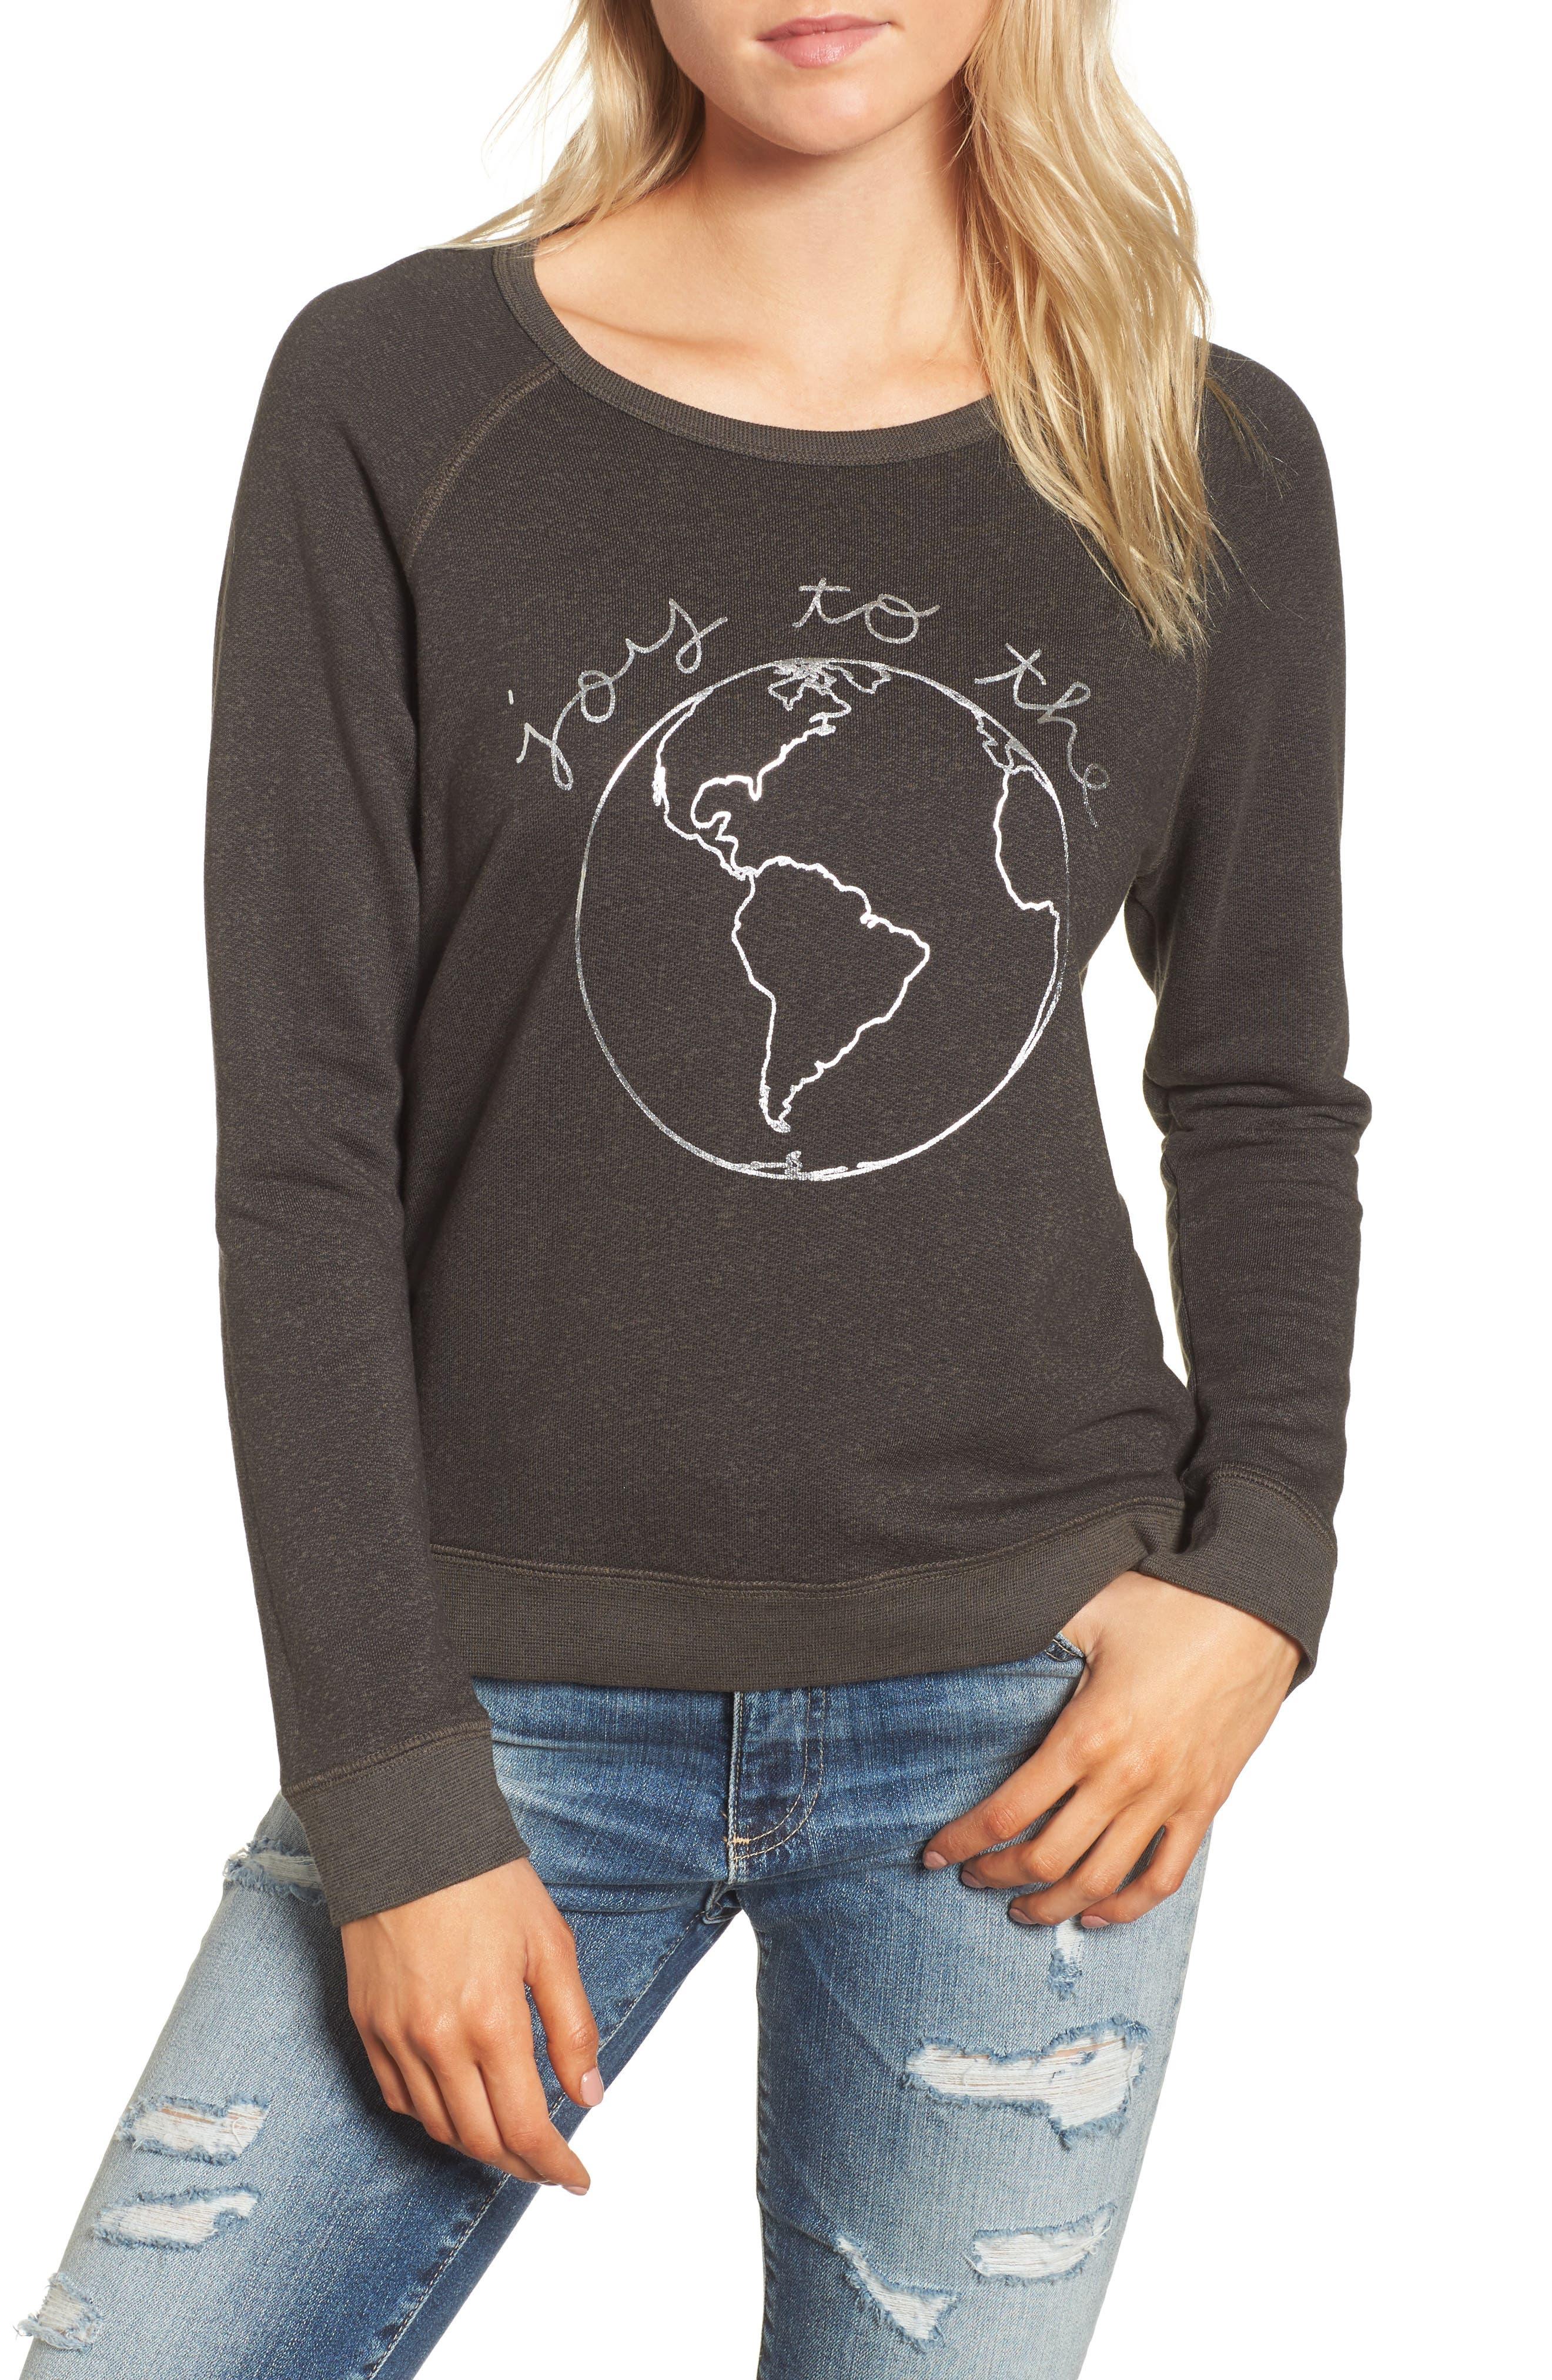 Joy to the World Sweatshirt,                         Main,                         color, Black